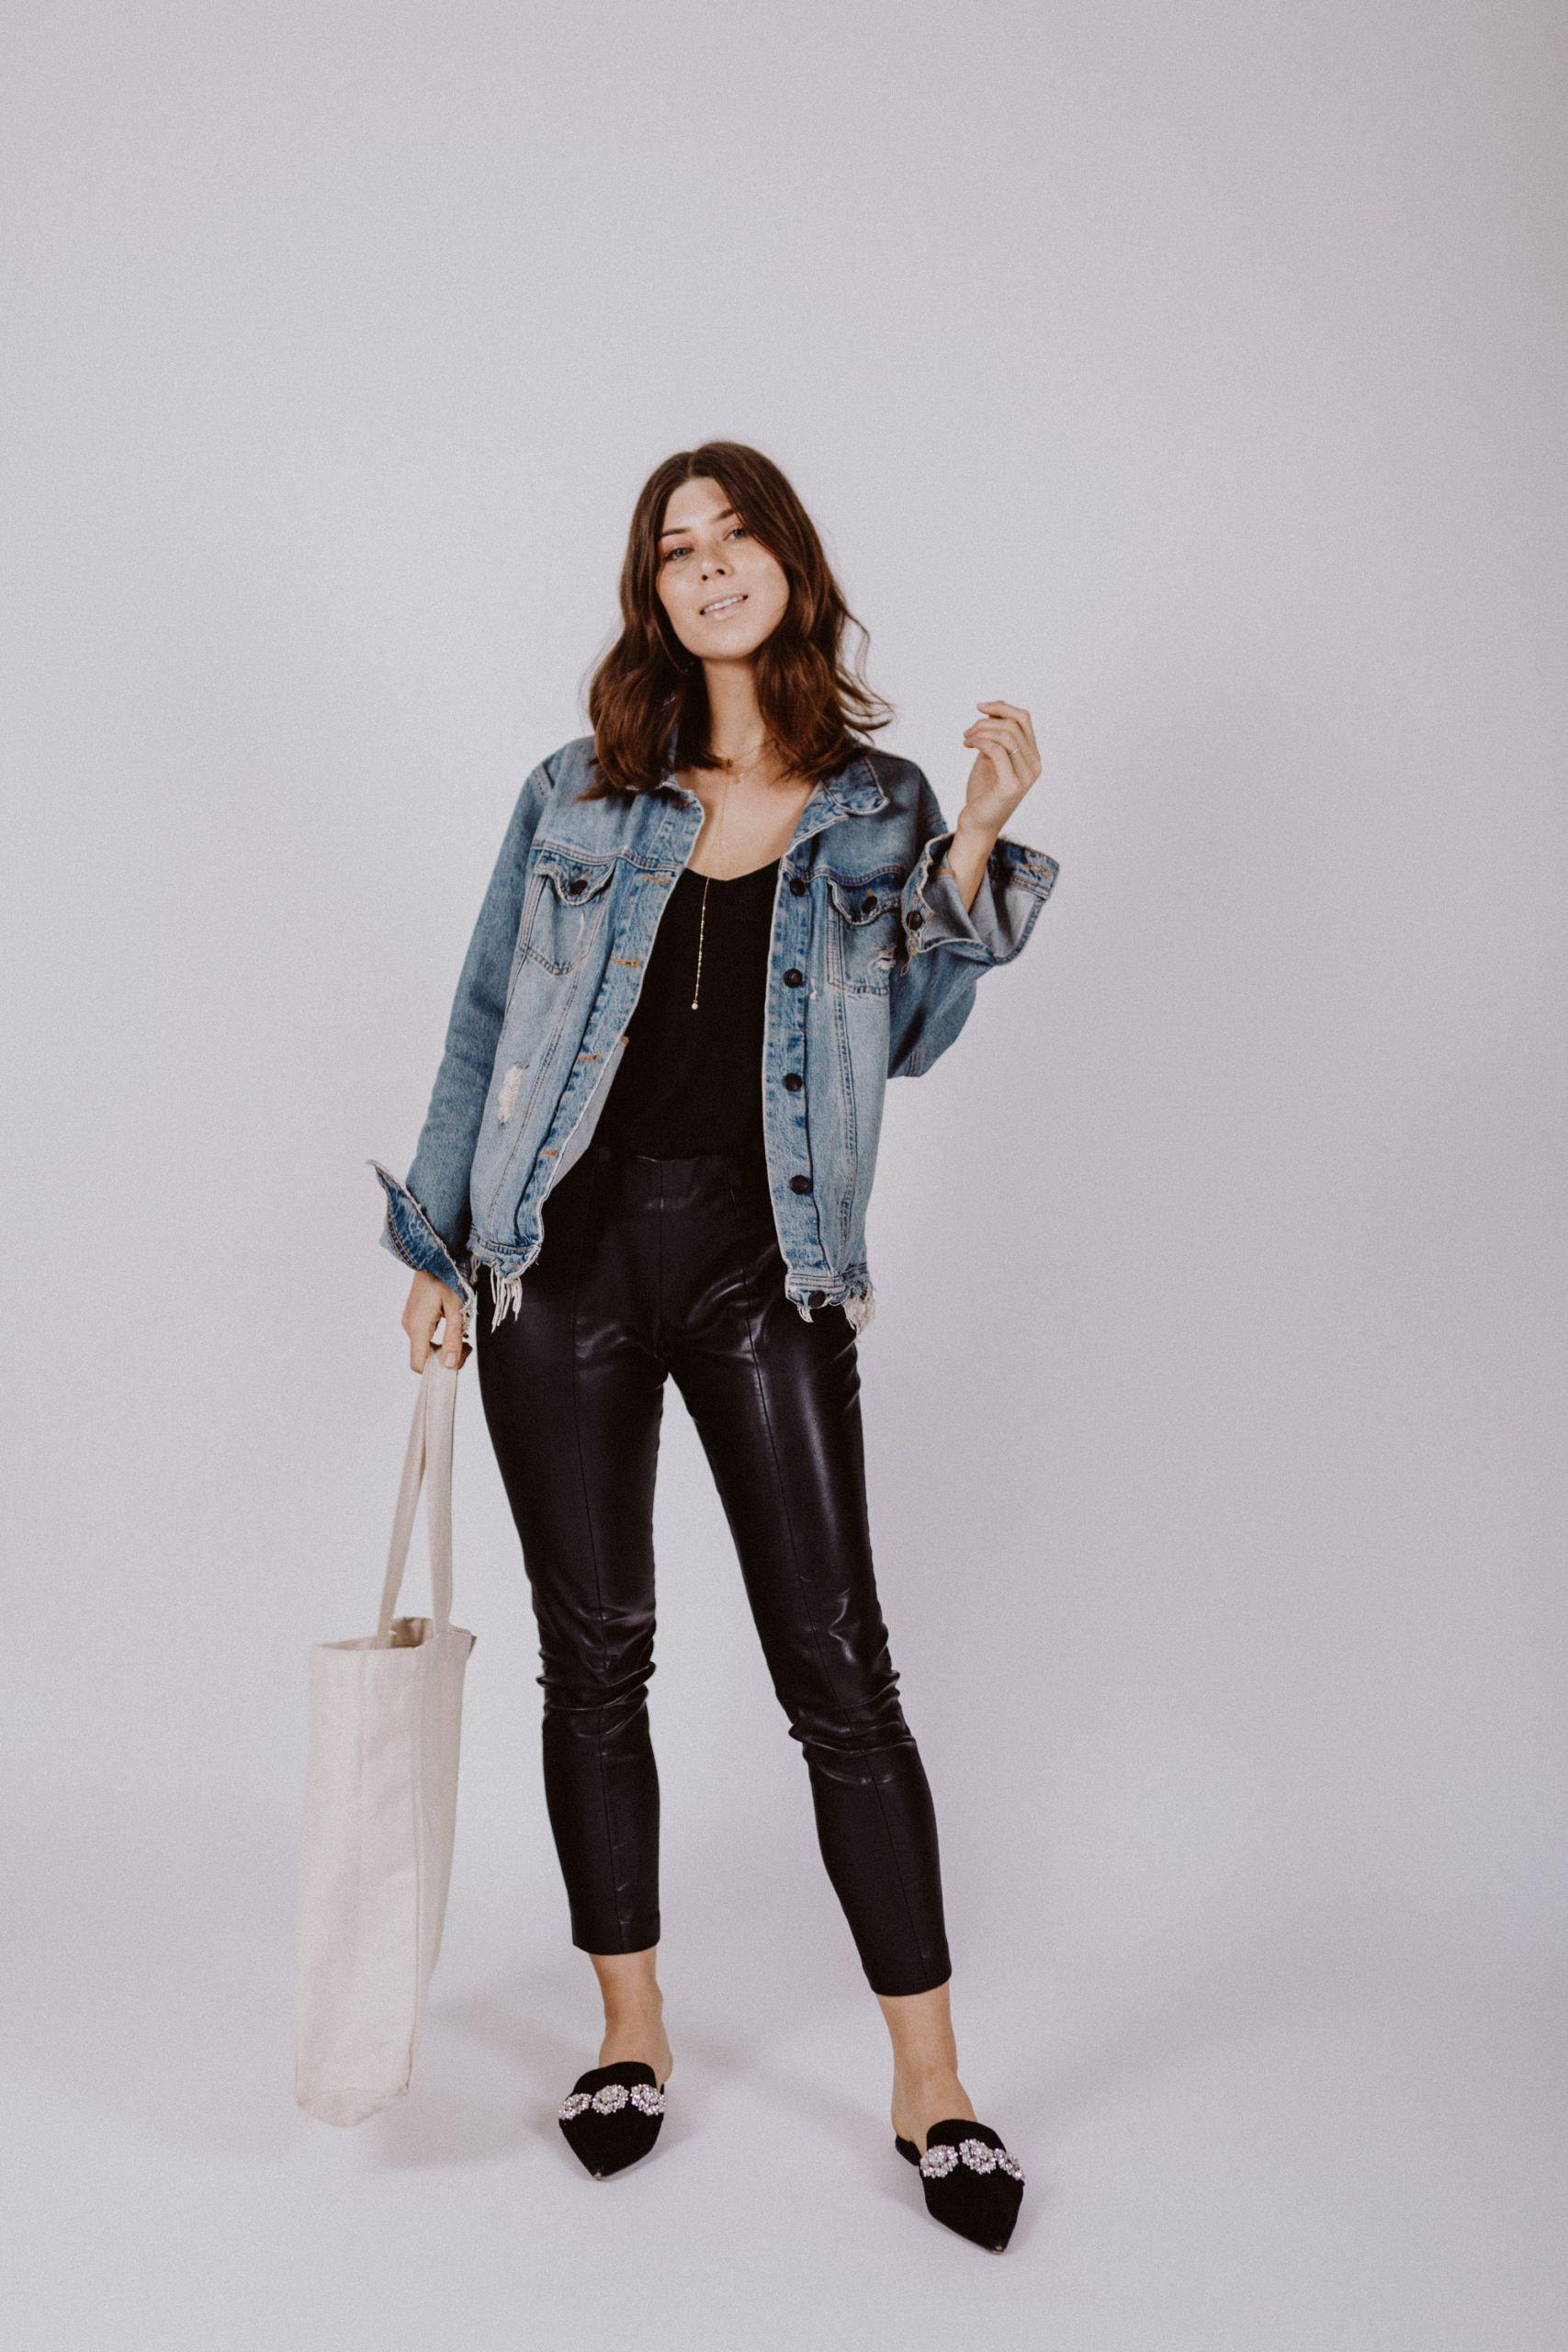 3 Ways To Wear: Oversized Denim Jacket | Love Daily Dose